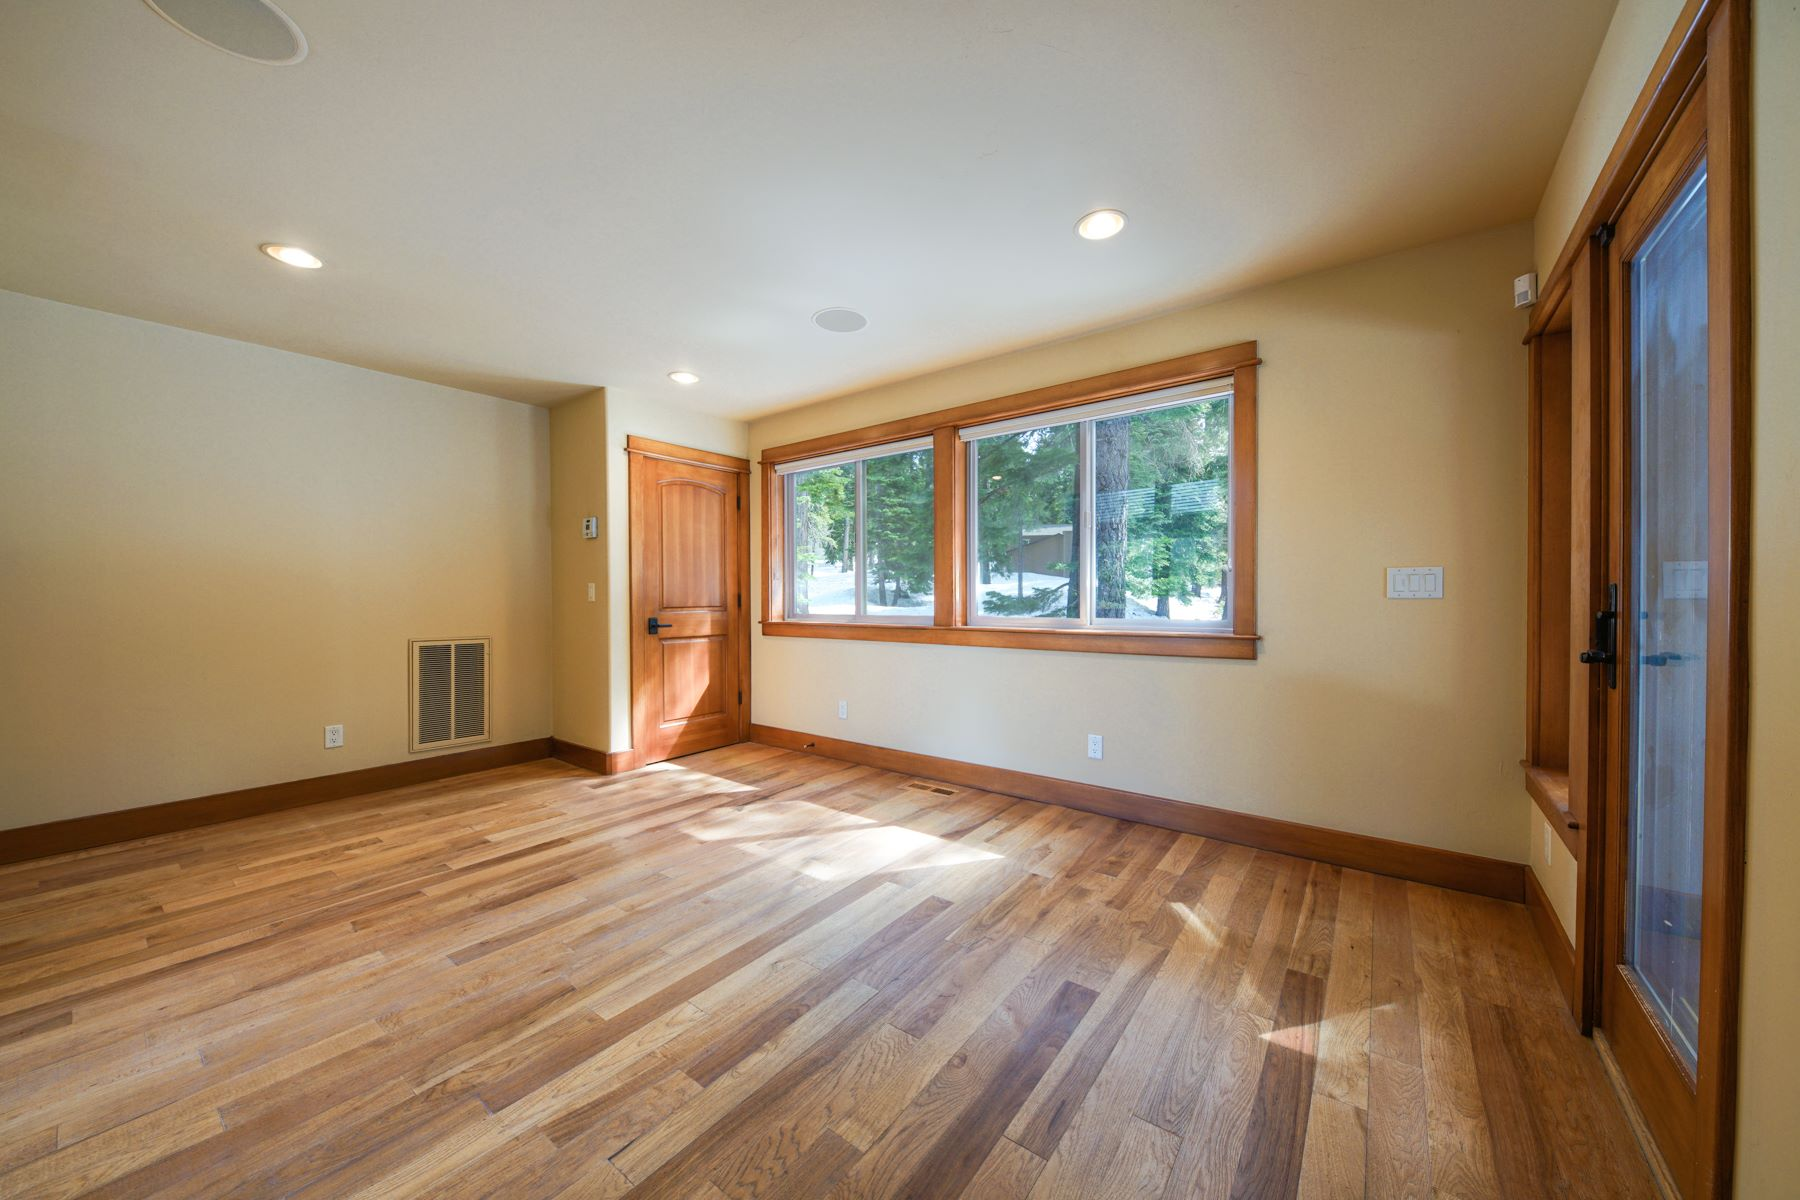 Additional photo for property listing at 1003 Marlene Street, Incline Village, Nevada 1003 Marlene Street Incline Village, Nevada 89451 United States